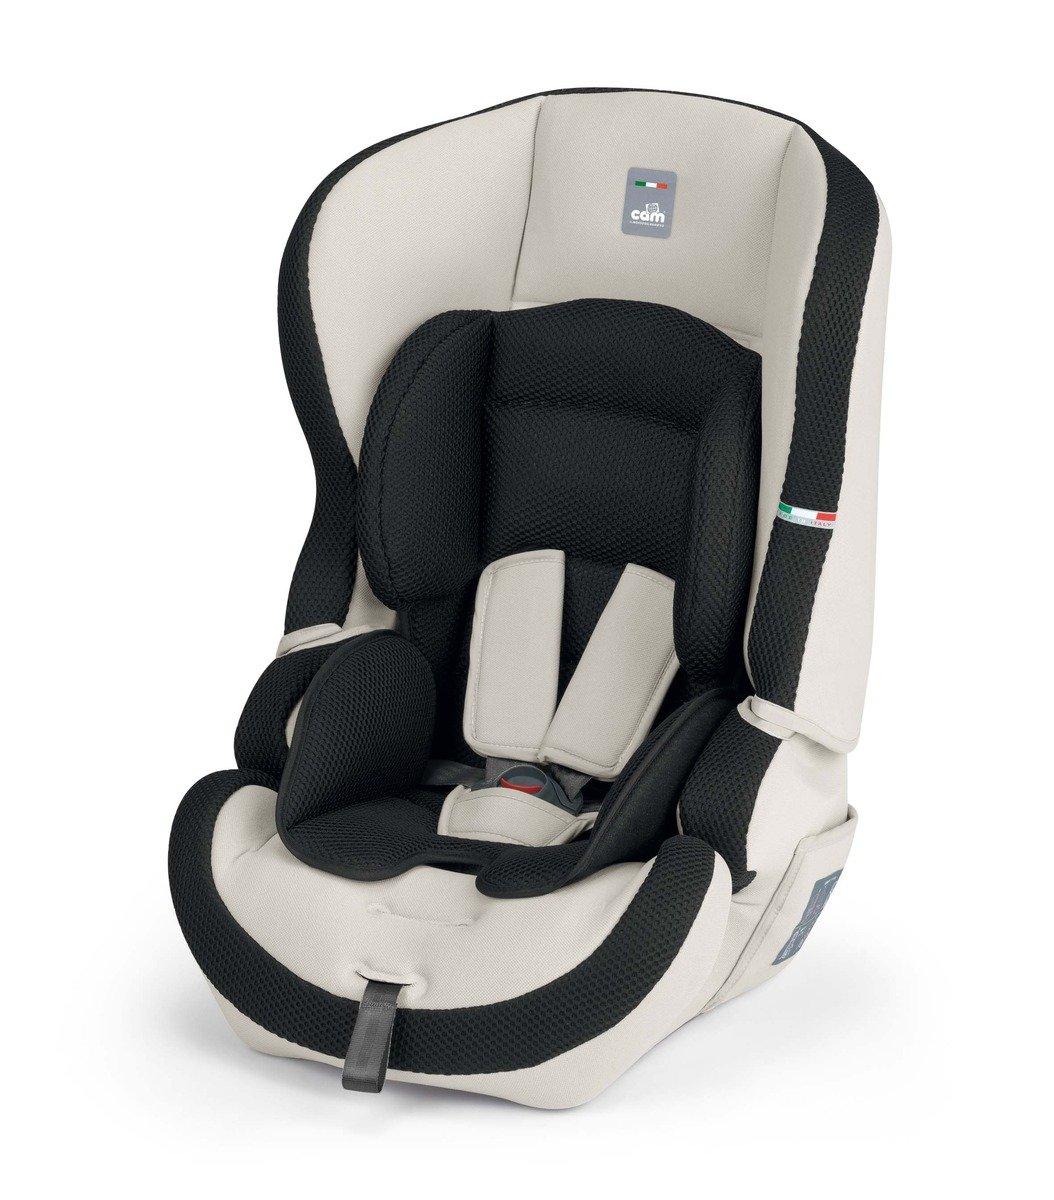 意大利 Travel Evolution 汽車安全座椅